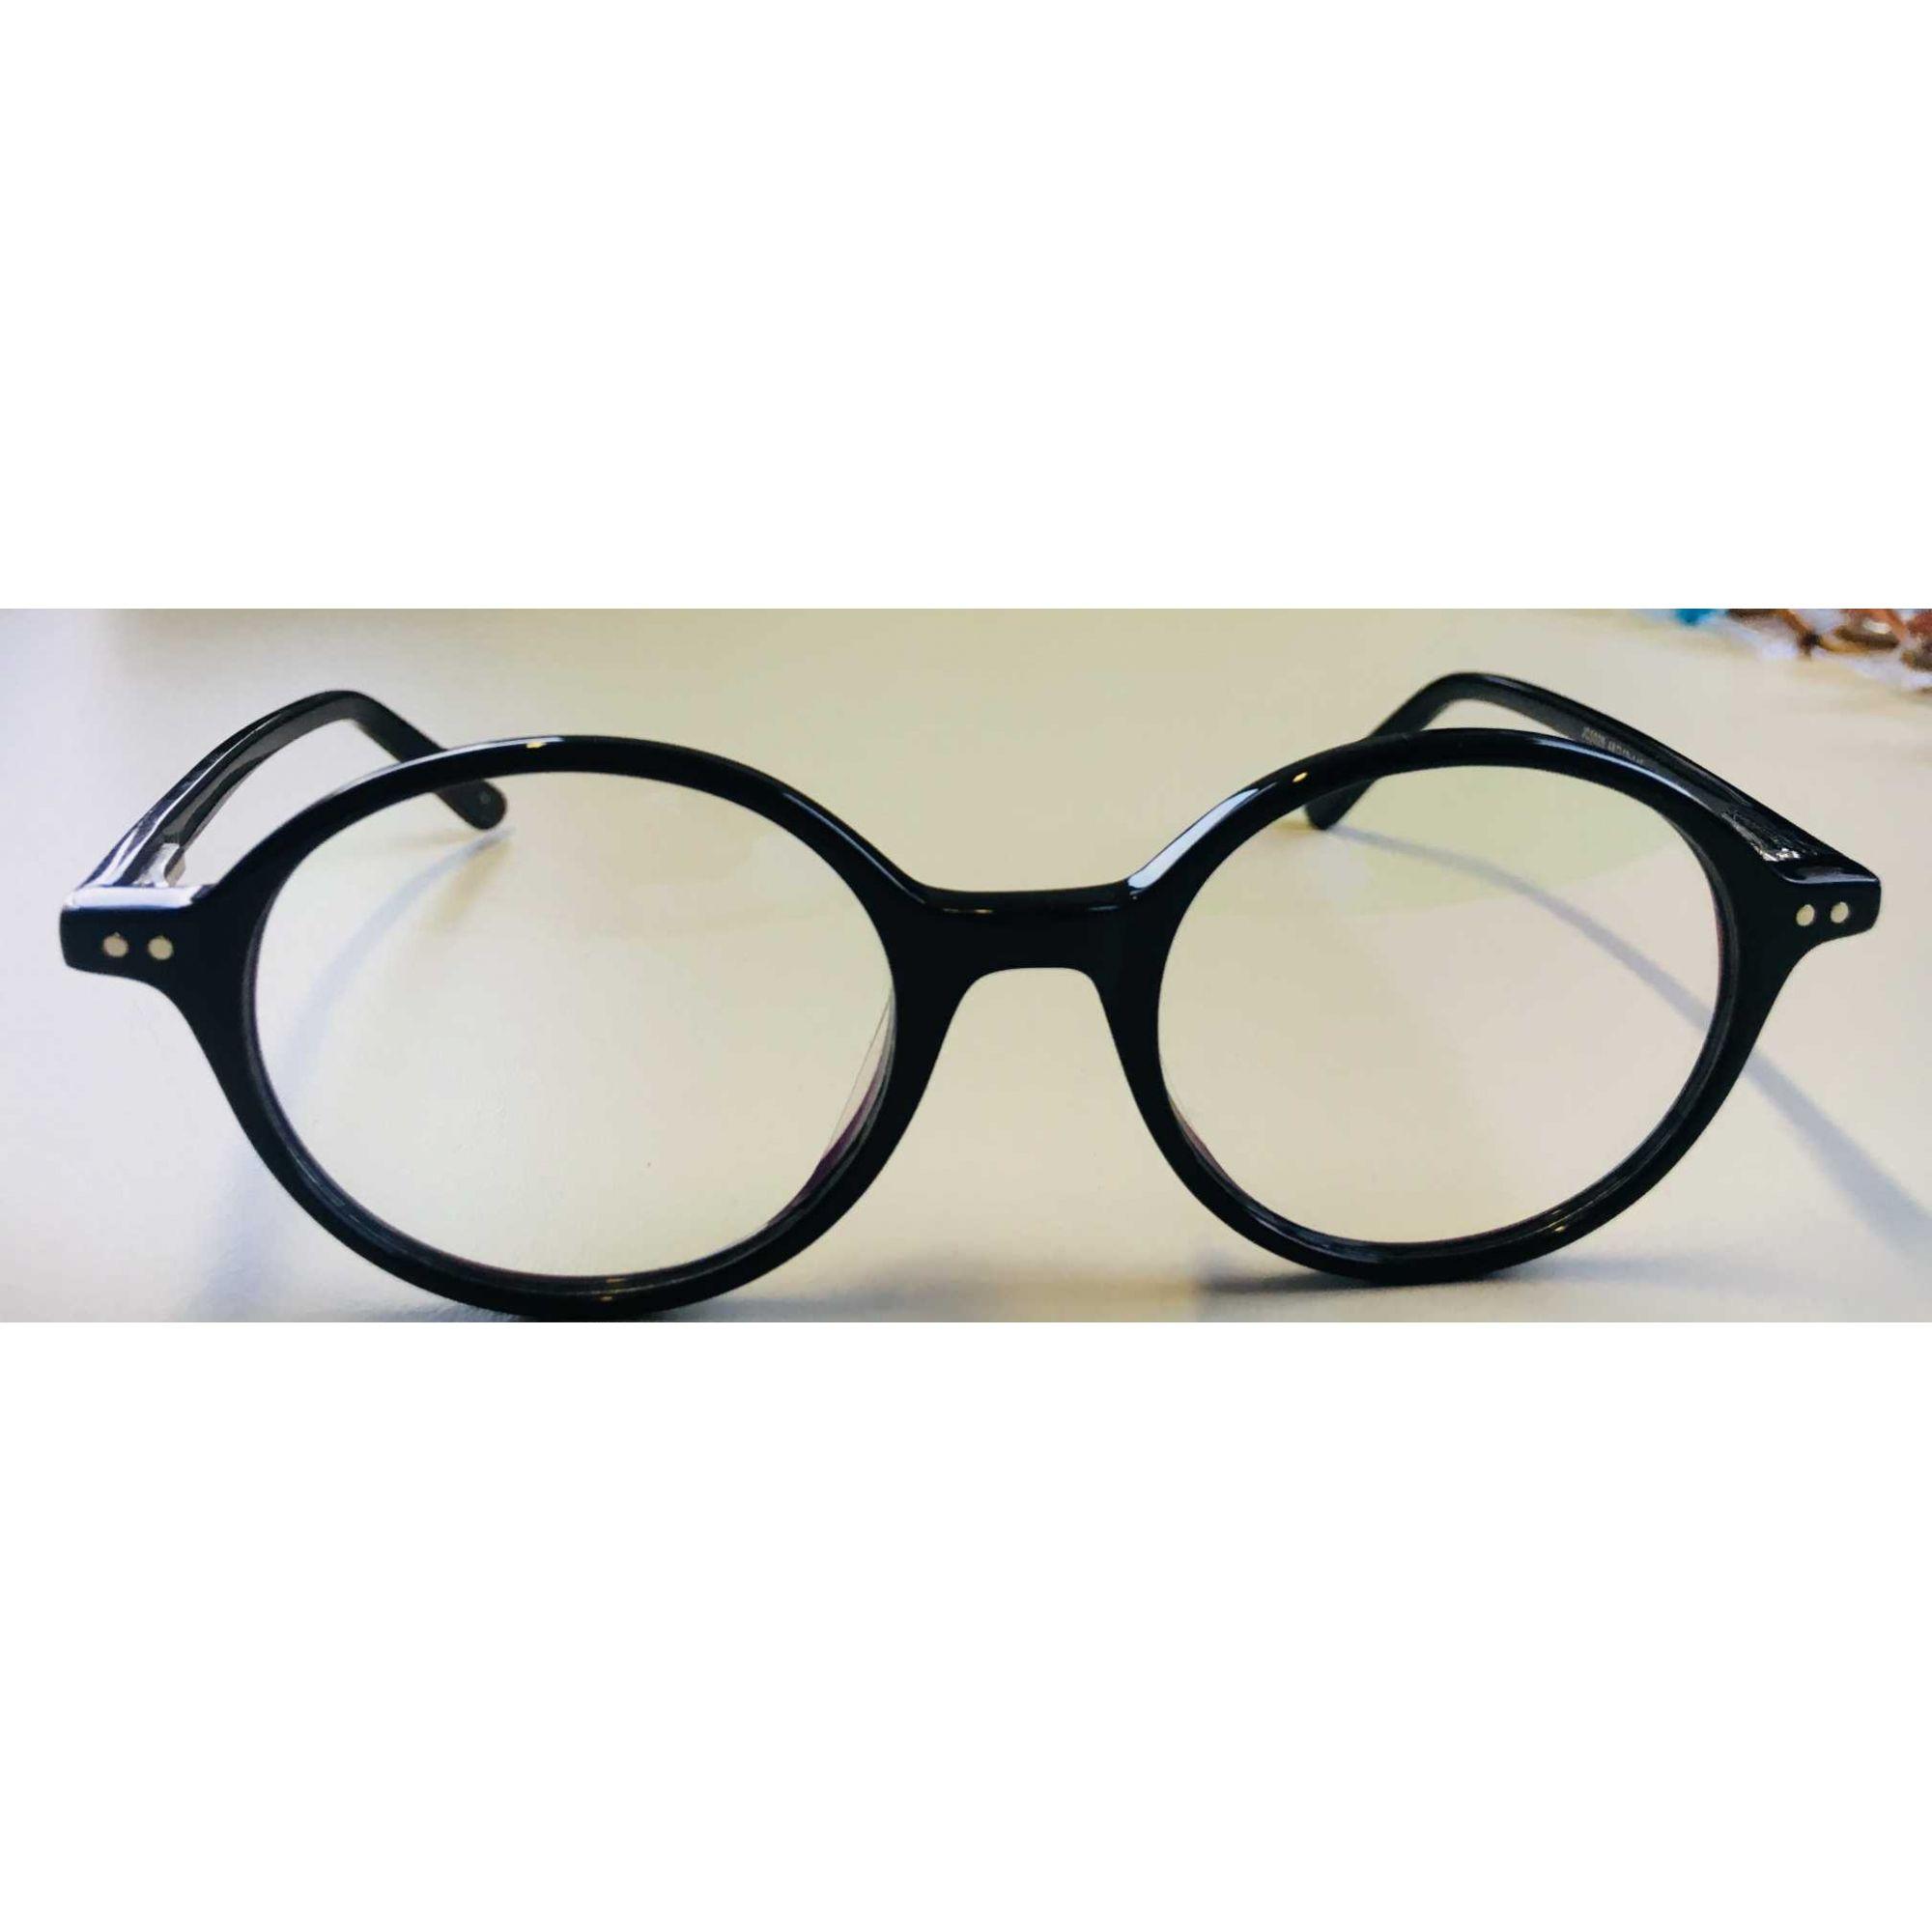 812526aa8 Armação Óculos Grau Unissex Redondo Acetato Jô Preto